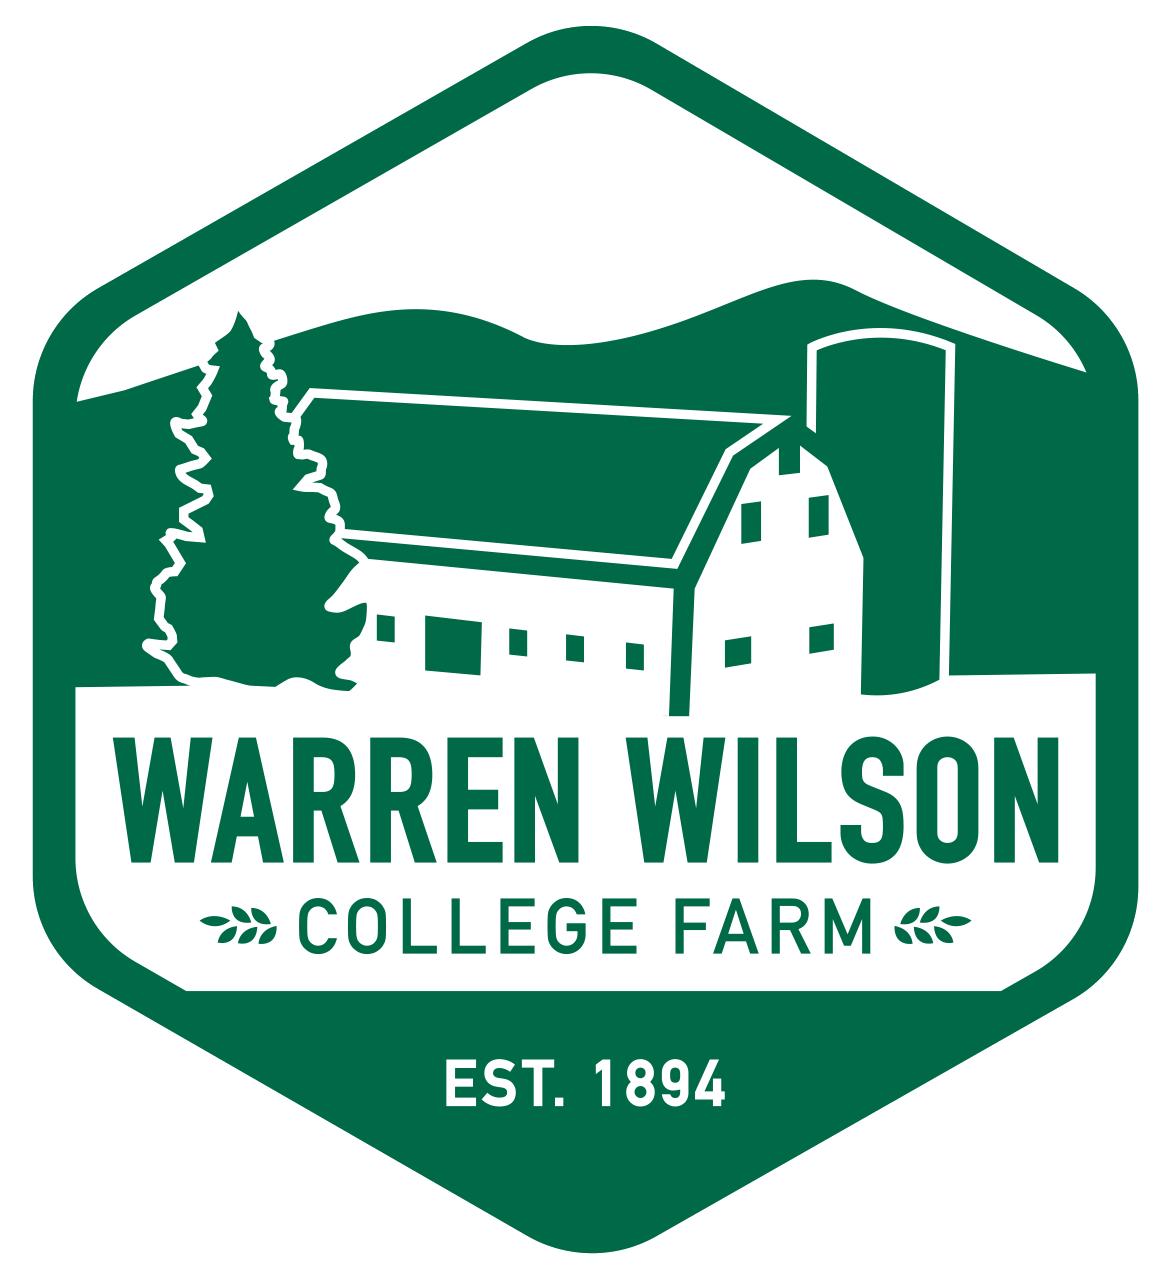 Warren Wilson College Farm Logo